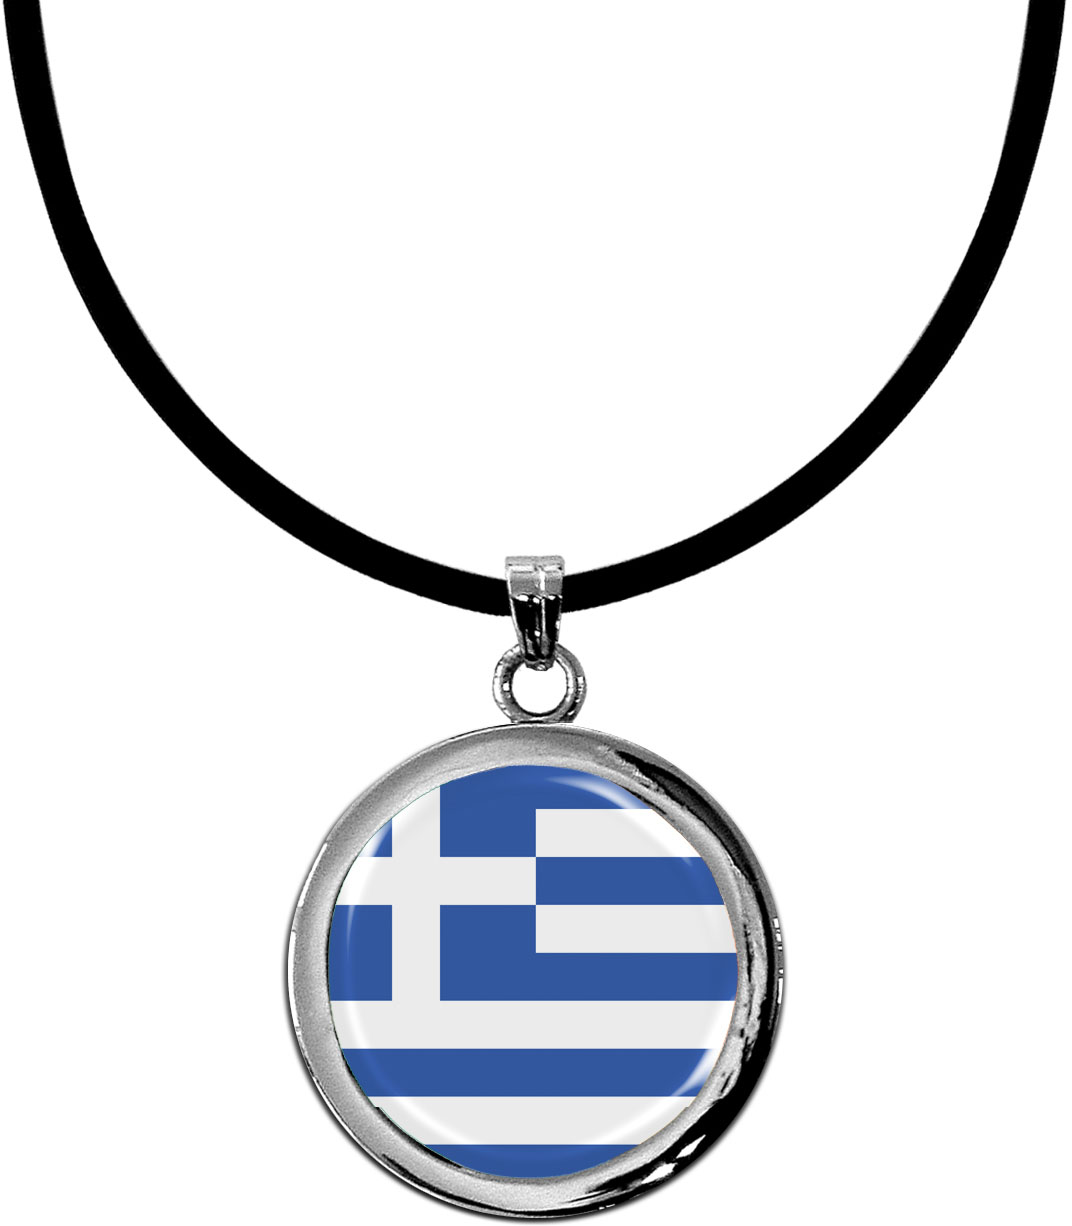 Kettenanhänger / Albanien / Silikonband mit Silberverschluss